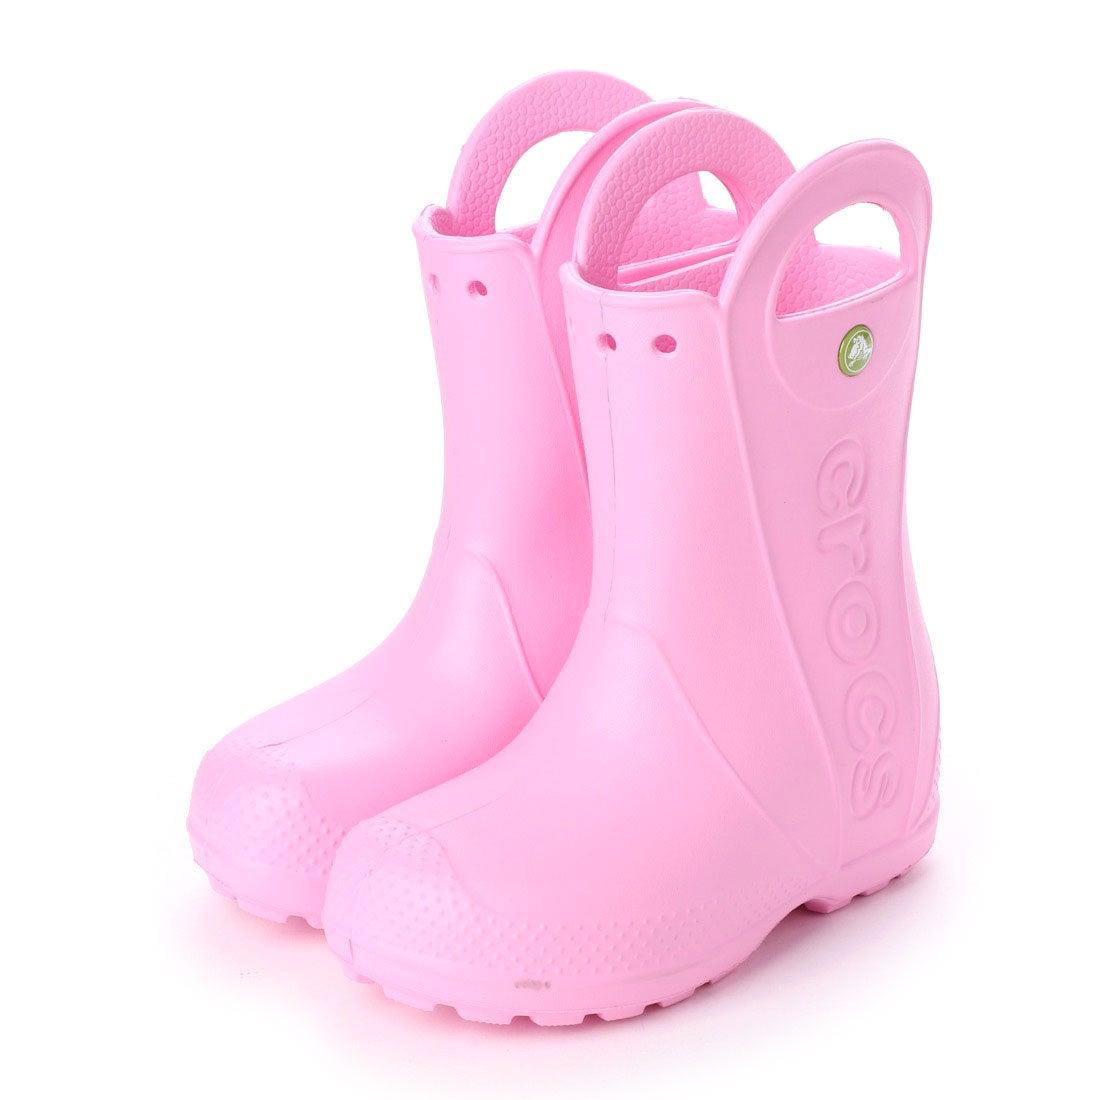 68cad35751b30 クロックス crocs 12803 ハンドルイット キッズ レインブーツ (カーネーション) -靴&ファッション通販 ロコンド〜自宅で試着、気軽に返品